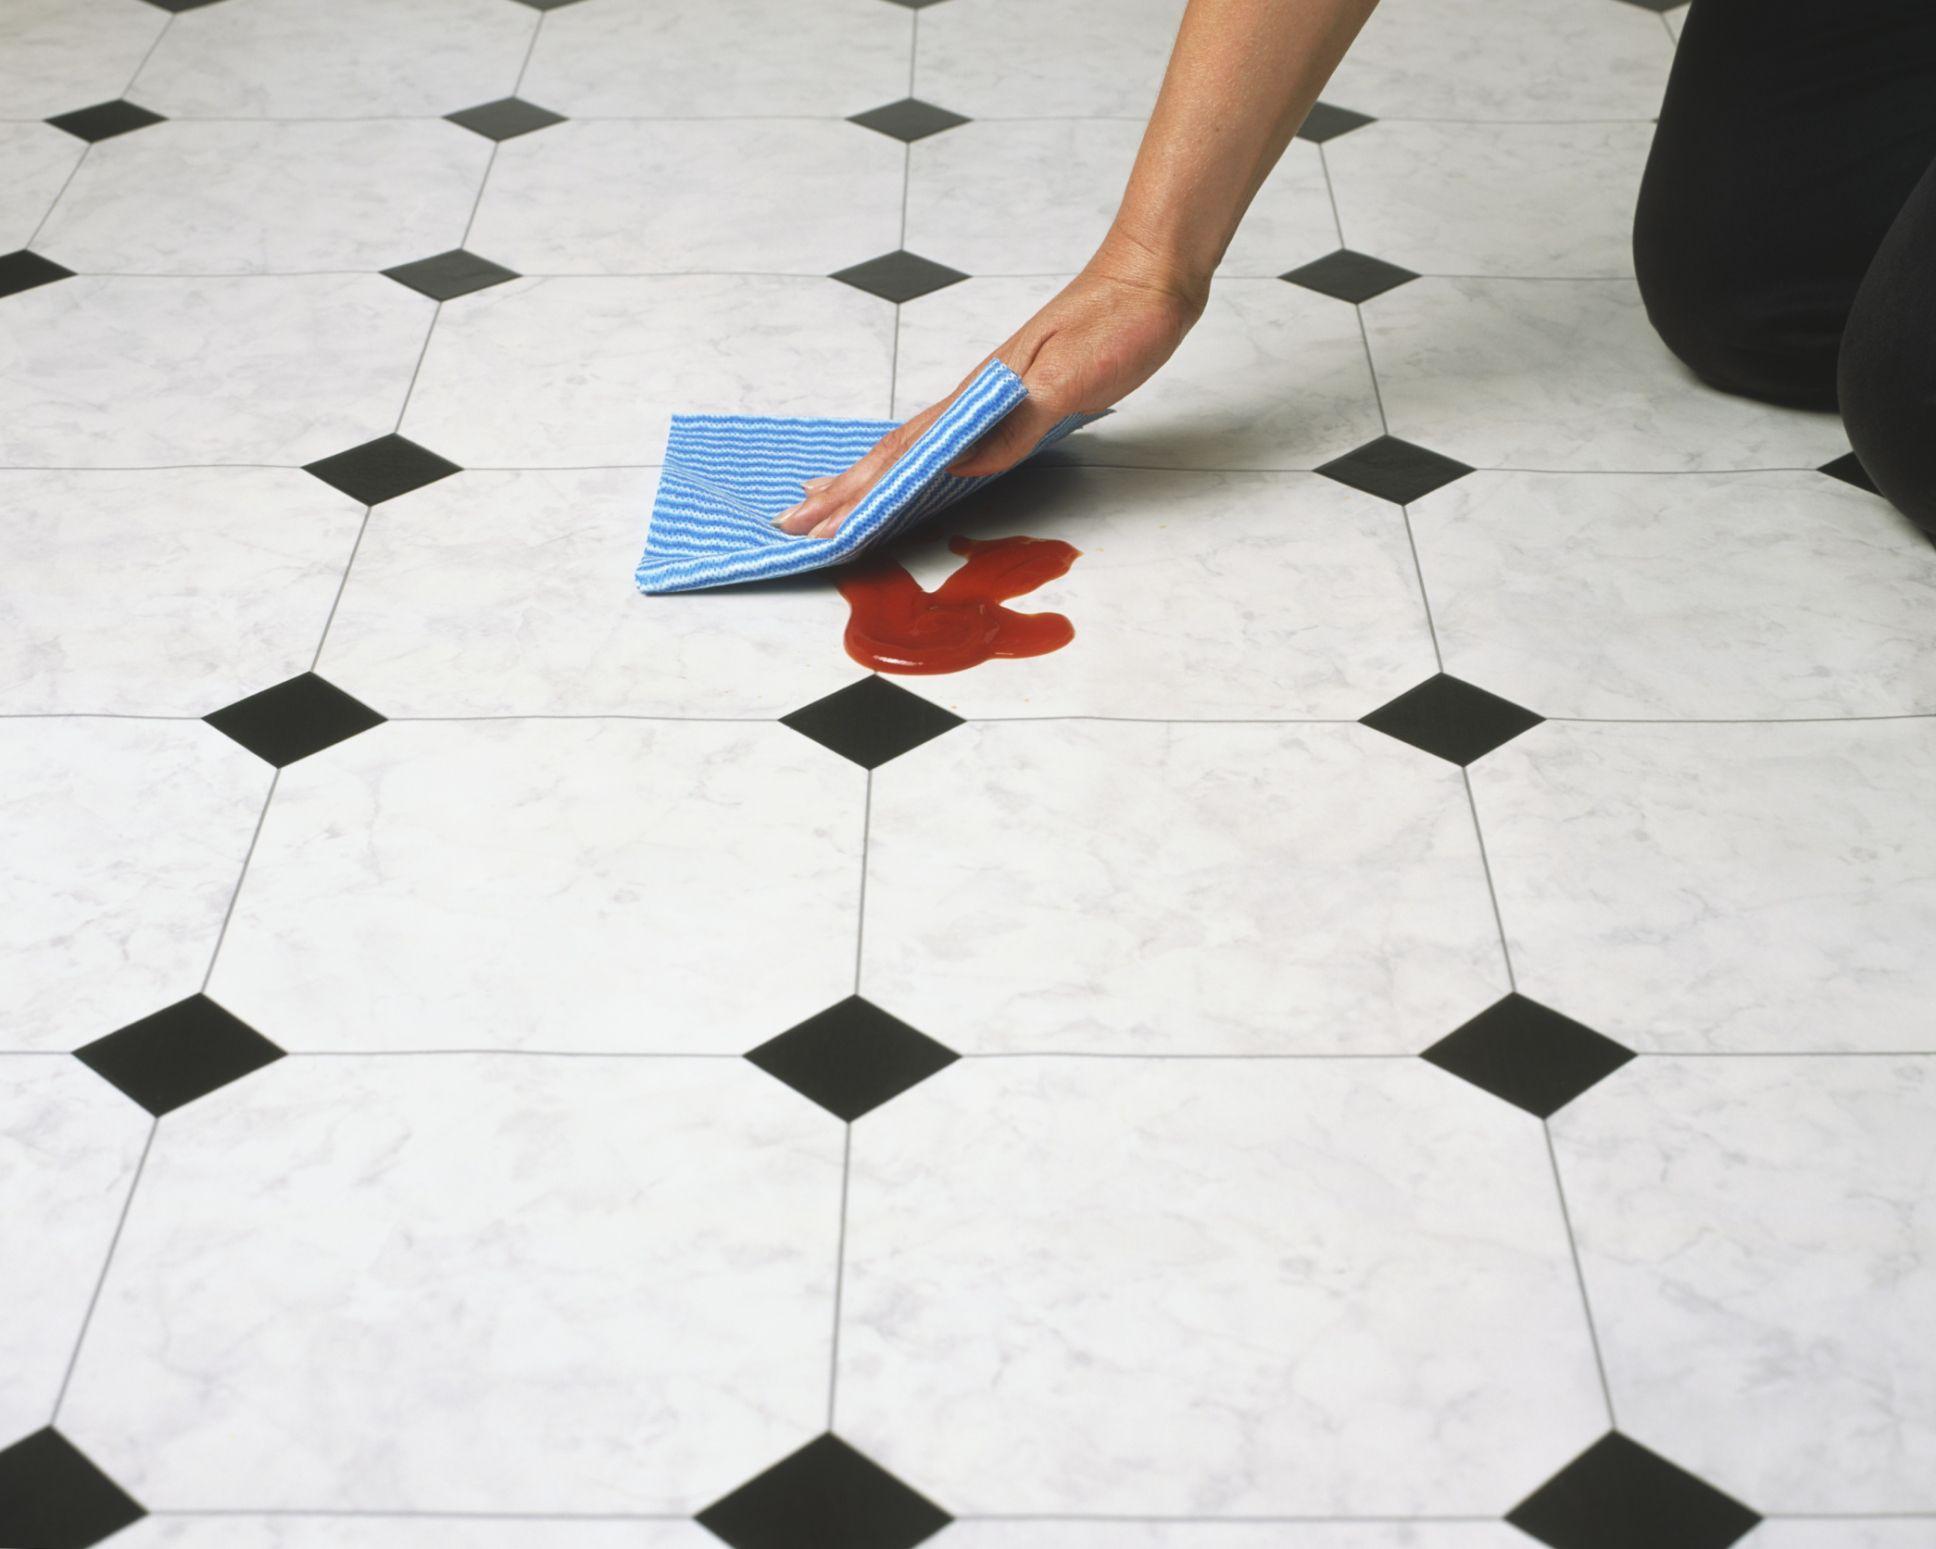 Vinyl versus linoleum flooring a look at the eco friendly benefits of natural linoleum floors dailygadgetfo Images